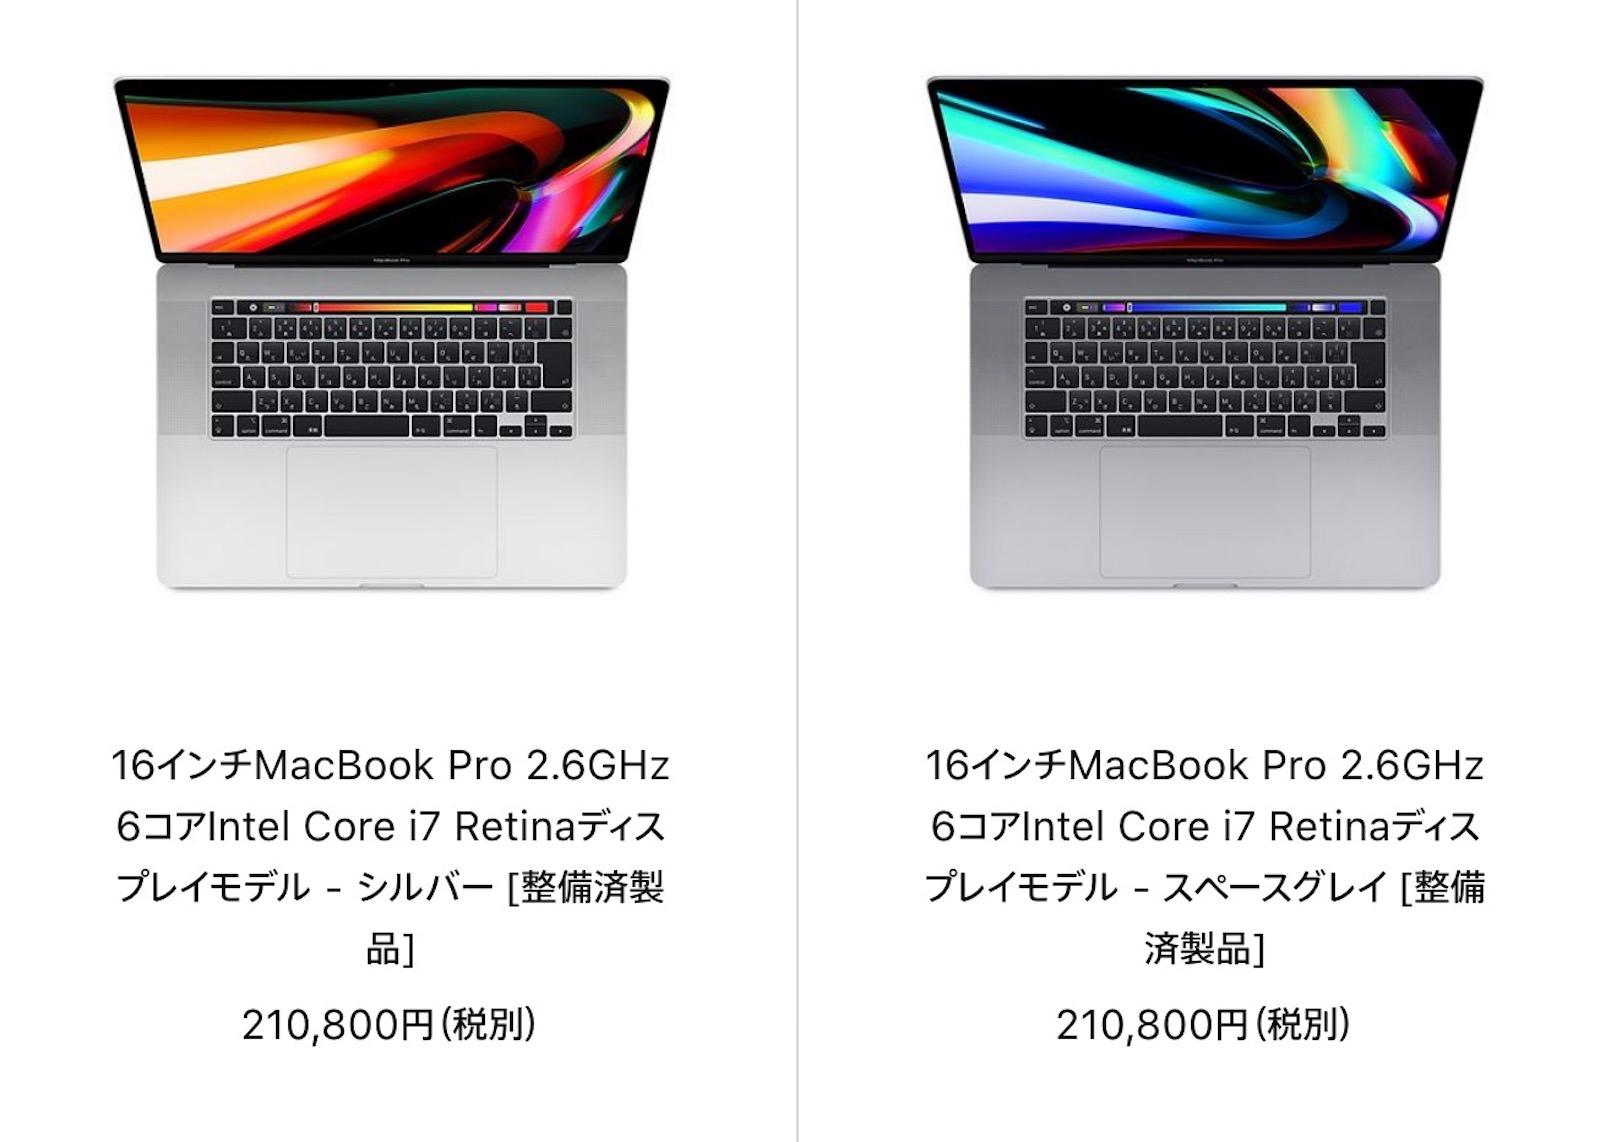 Macbook pro 16inch on sale